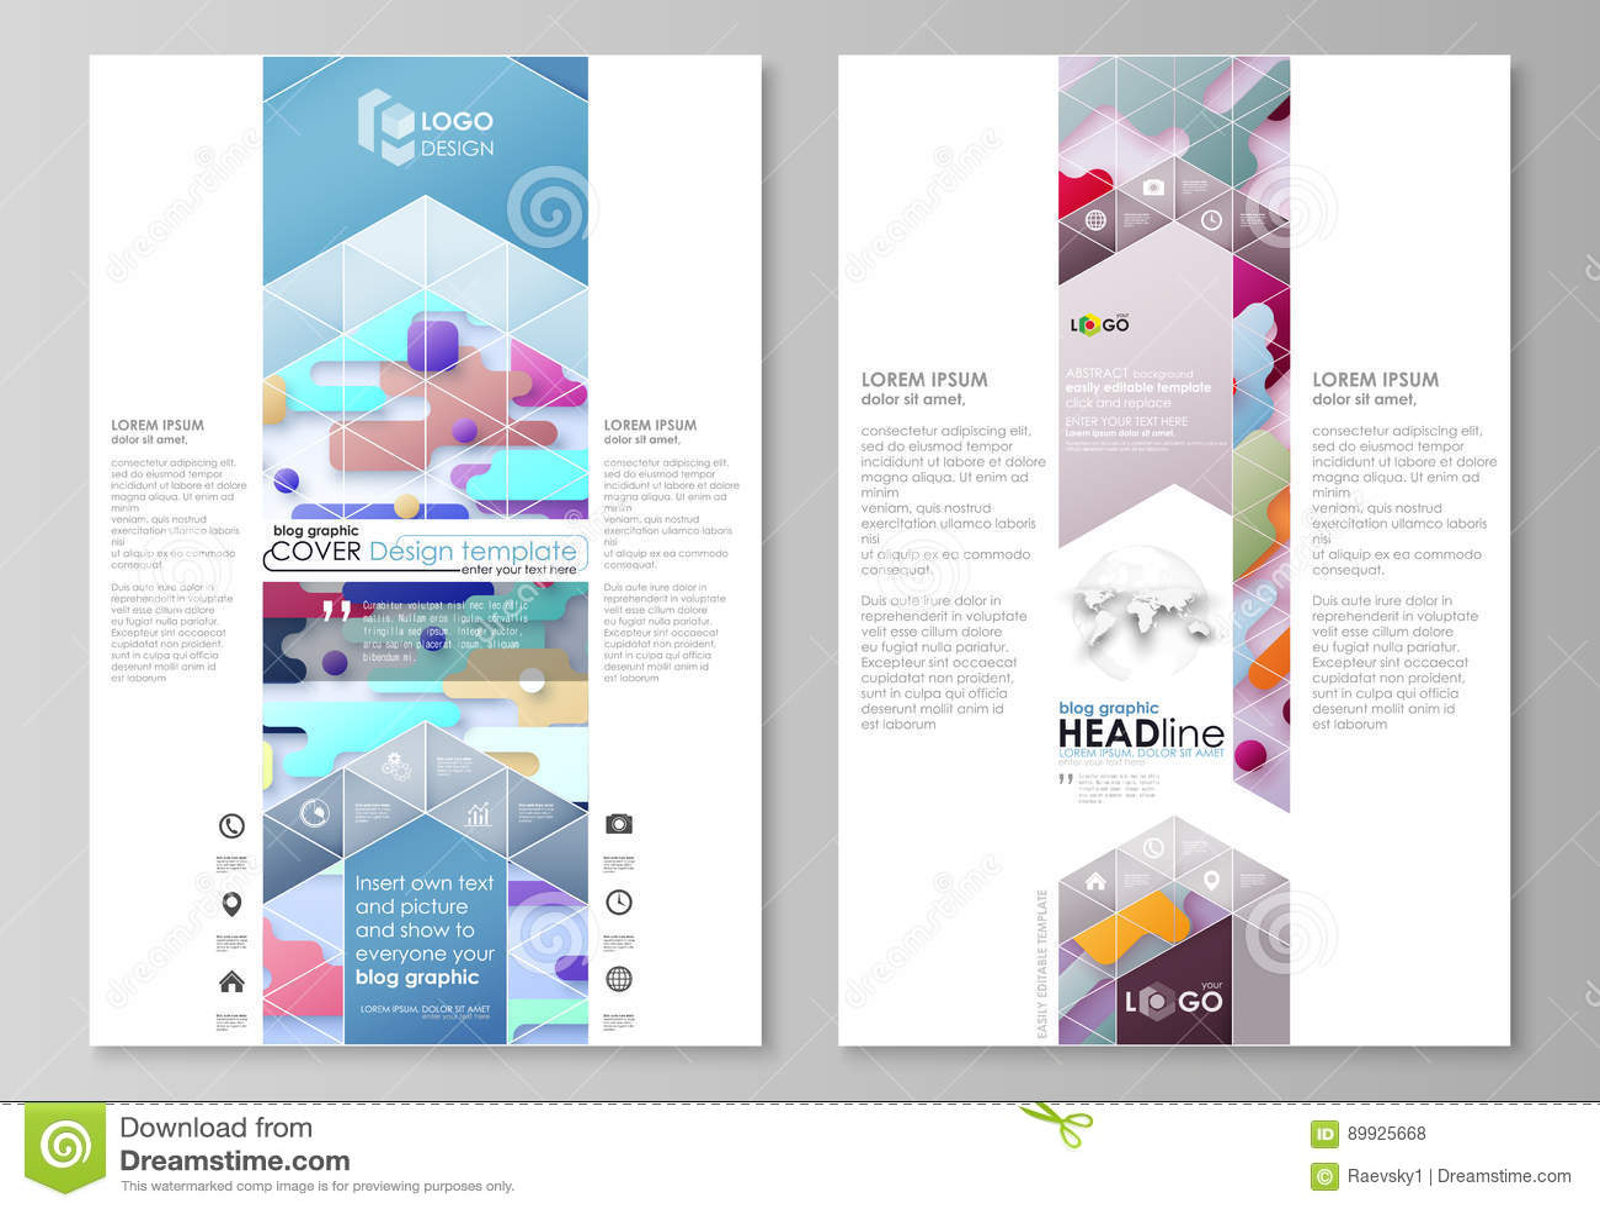 Design Blog 100+ blog design templates | effectivenews responsive wp news